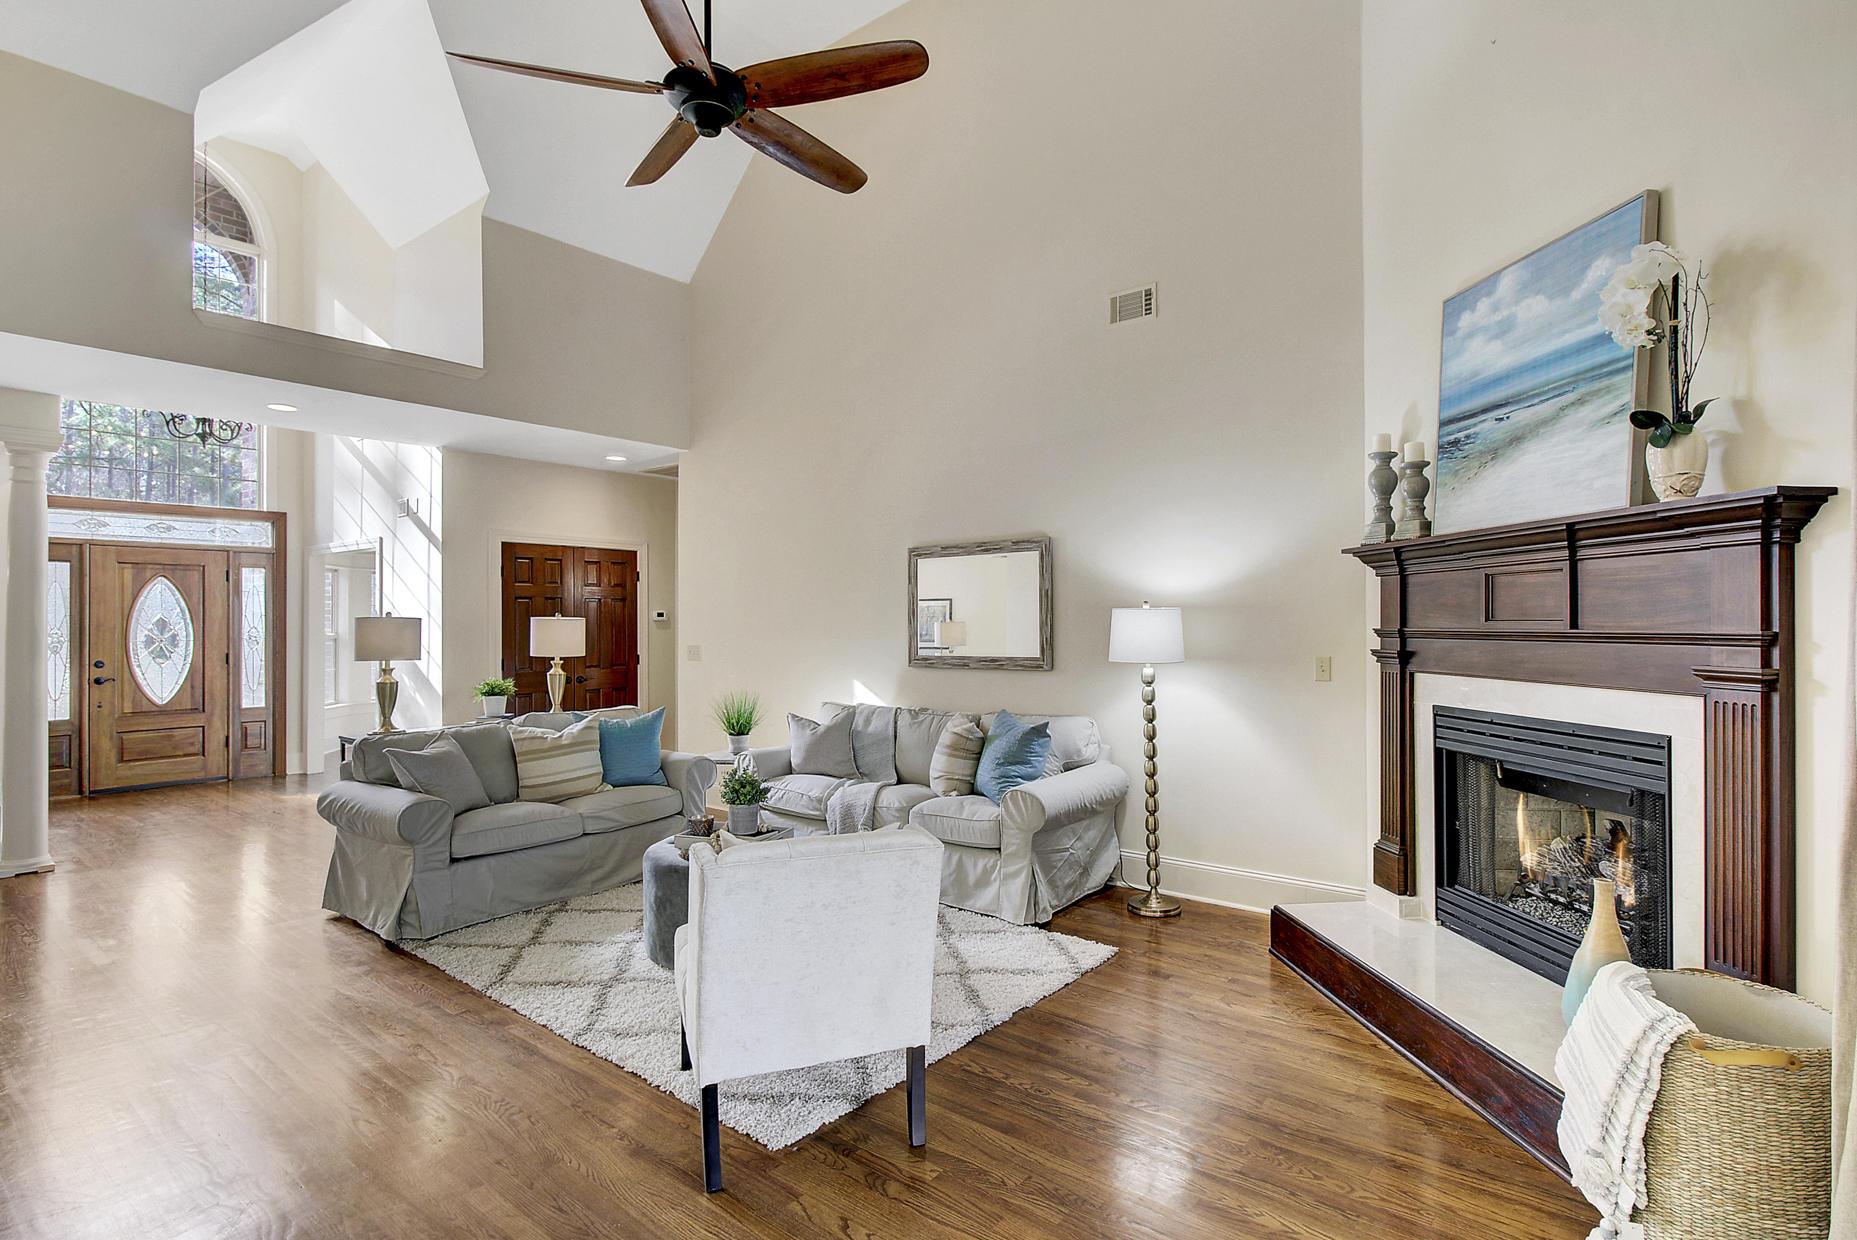 Dunes West Homes For Sale - 4123 Colonel Vanderhorst, Mount Pleasant, SC - 20